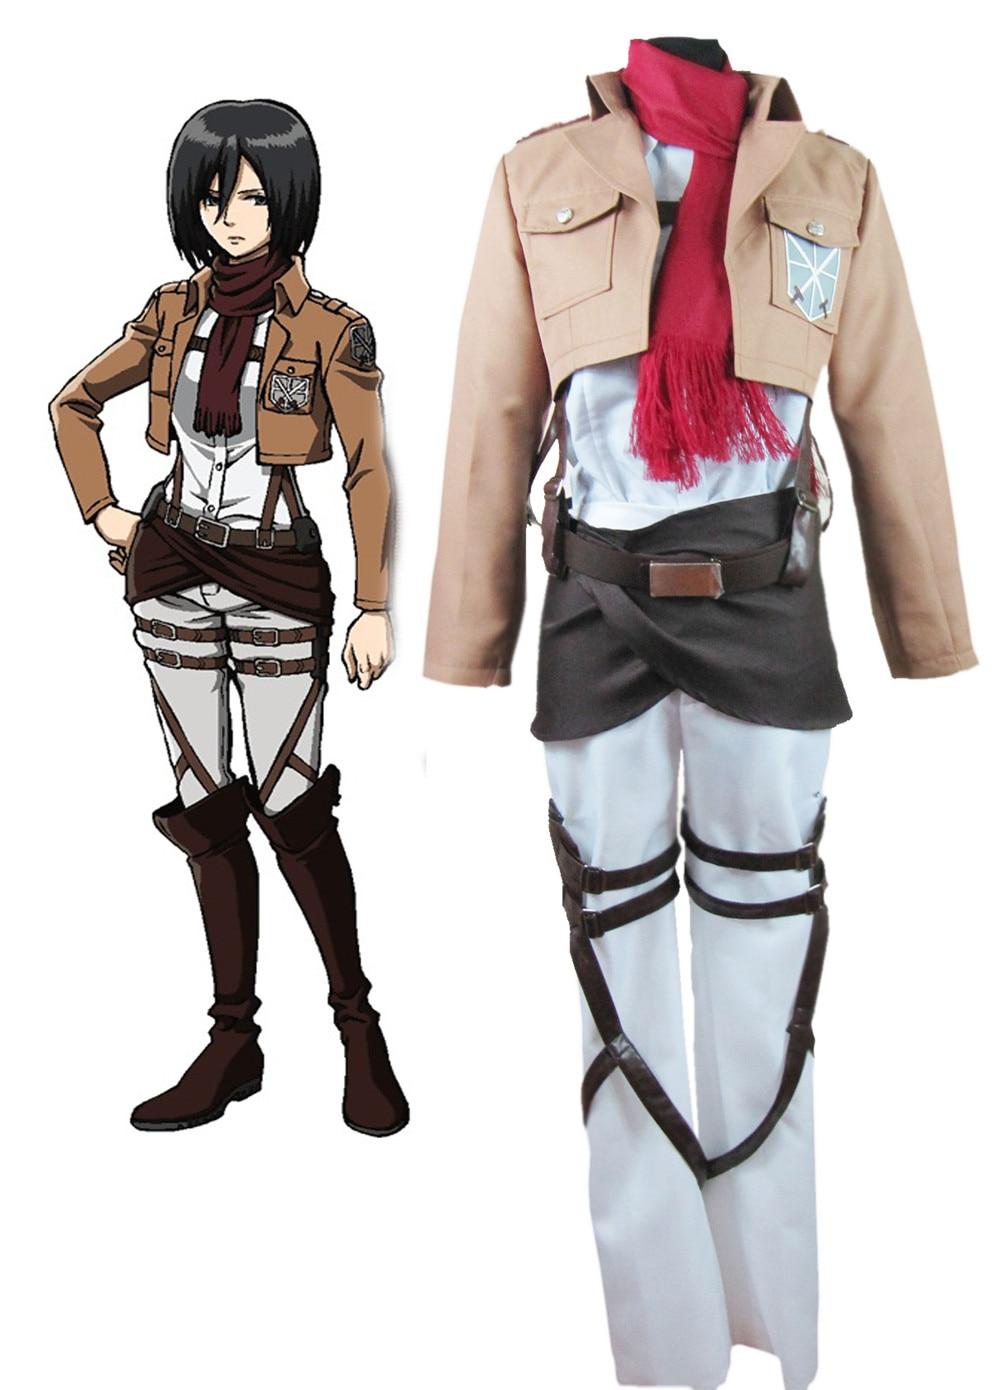 Attack on Titan Cosplay Levi Rivaille Rival Ackerman Costume Shingeki no Kyojin Survey Corps Uniform Adult Men Halloween